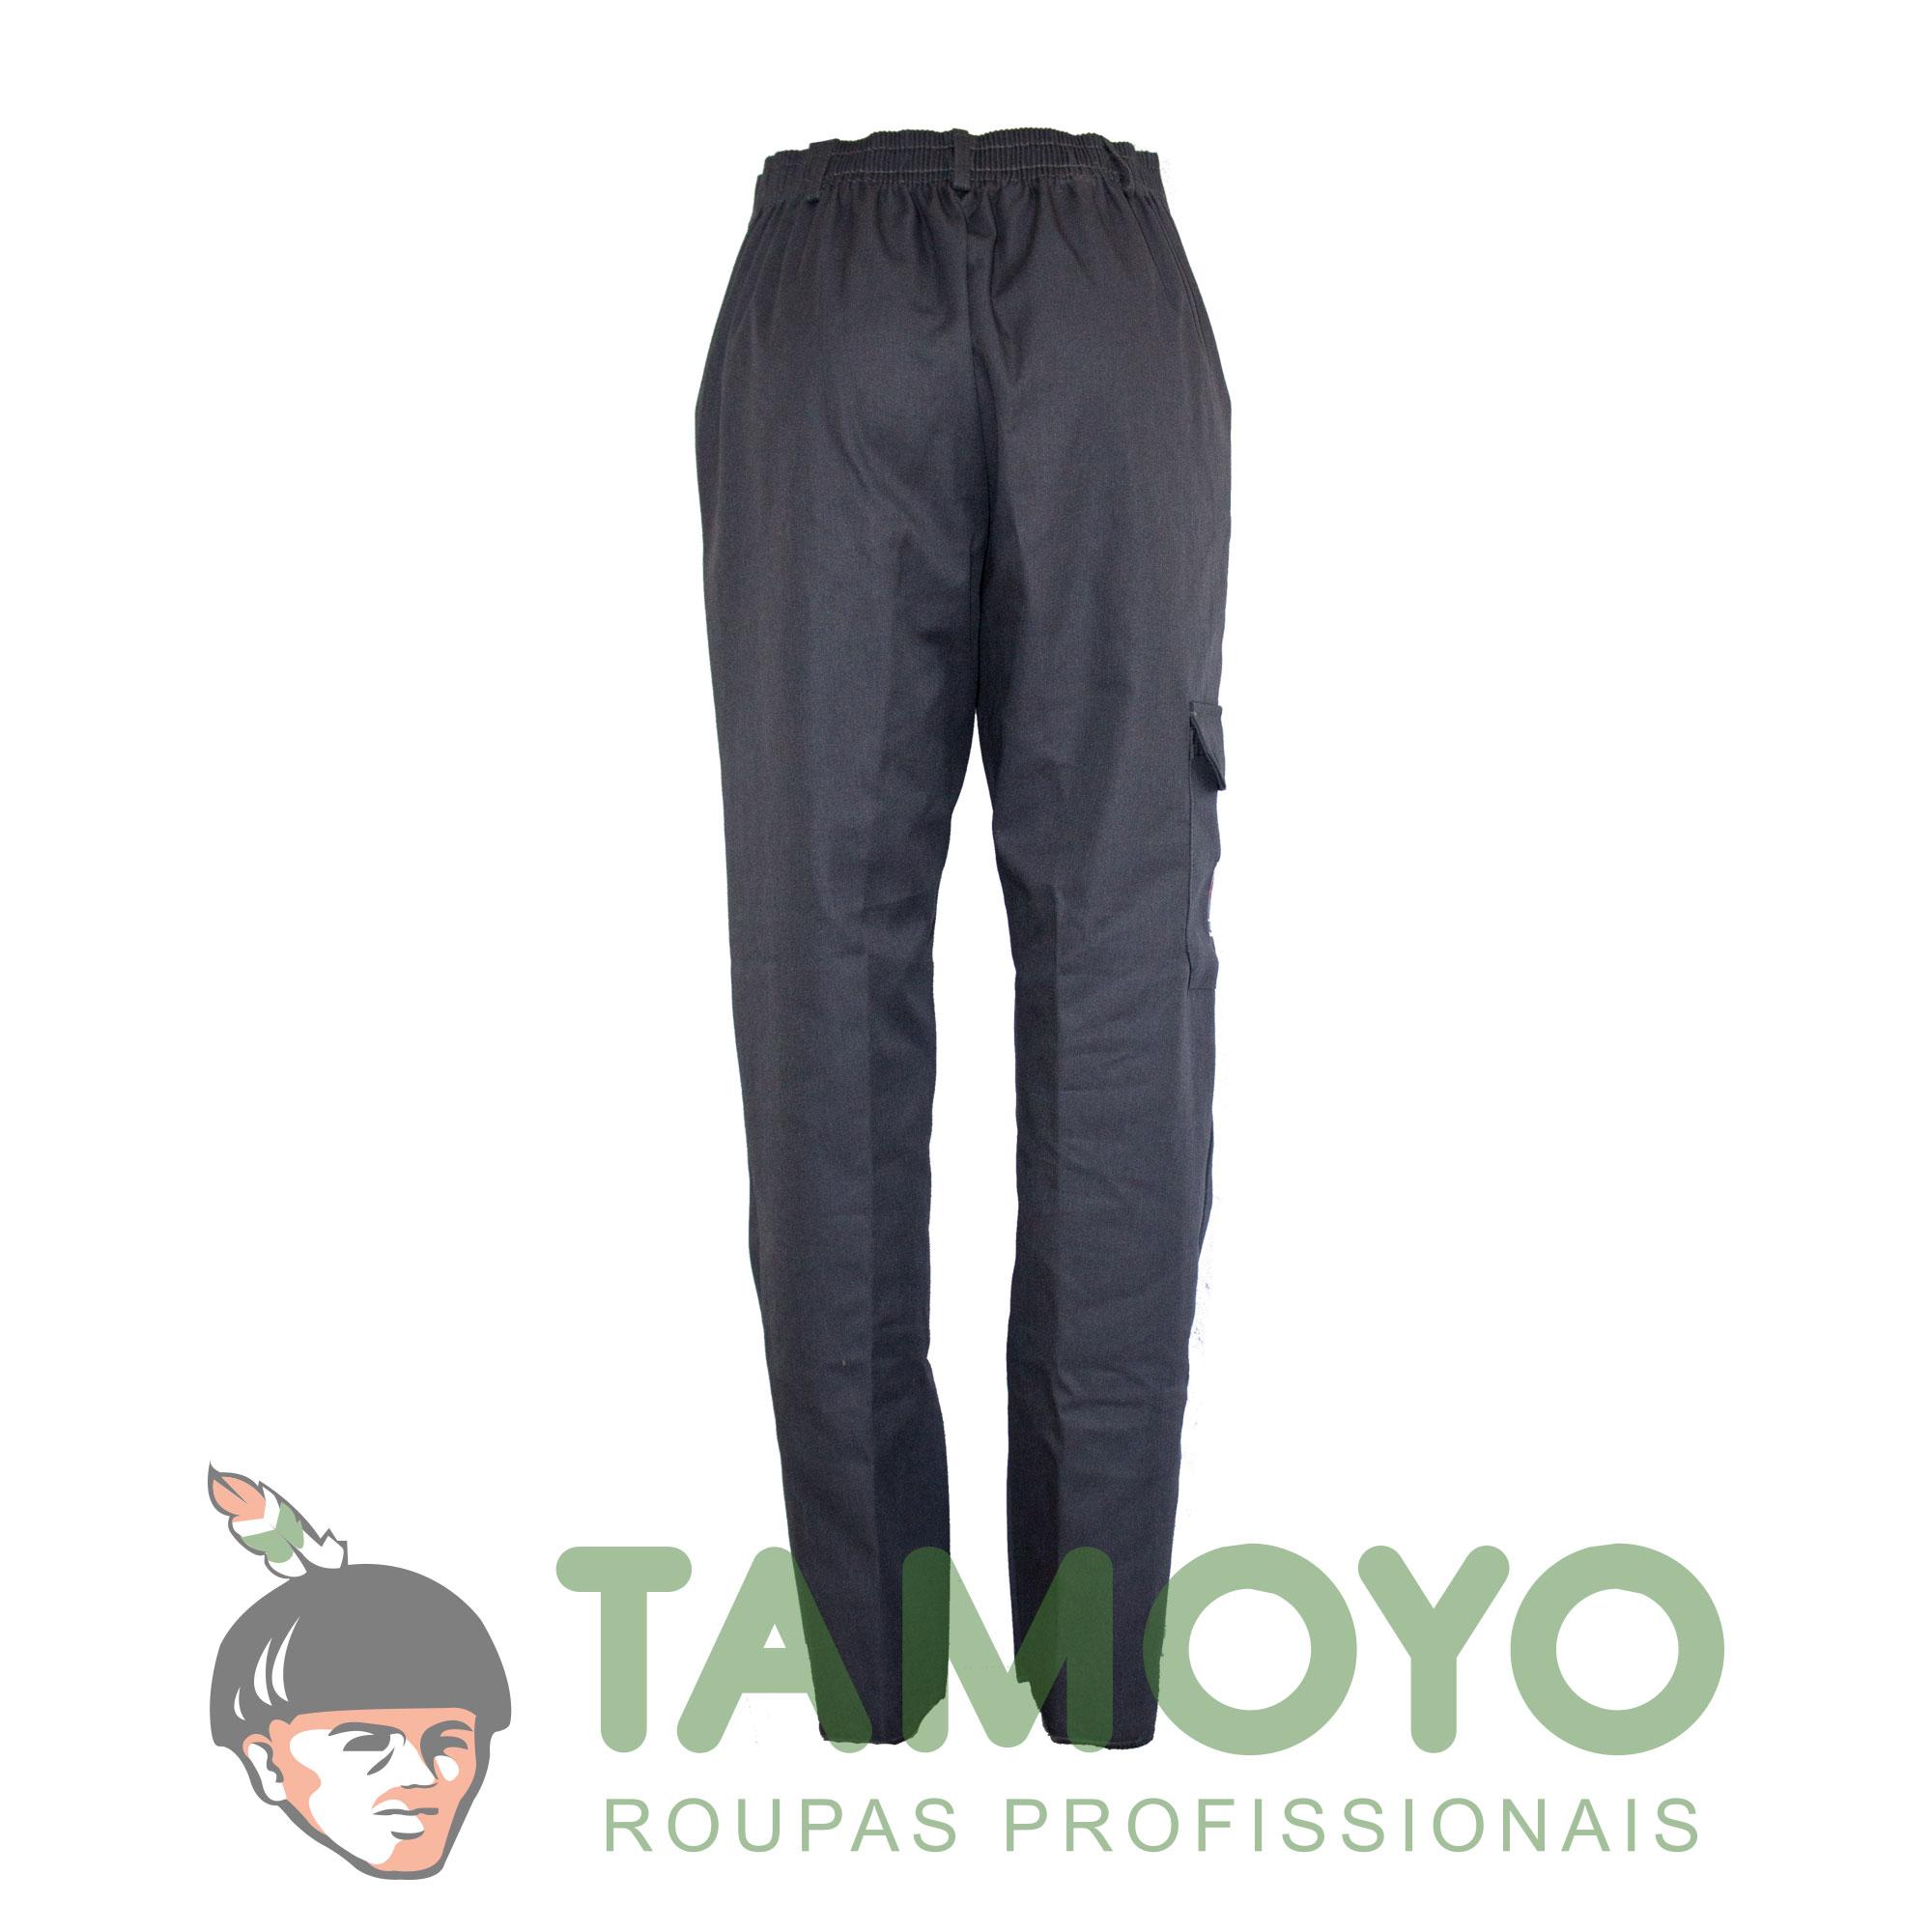 calca-frentista-feminina-boxter-roupas-tamoyo-uniformes-profissionais-c